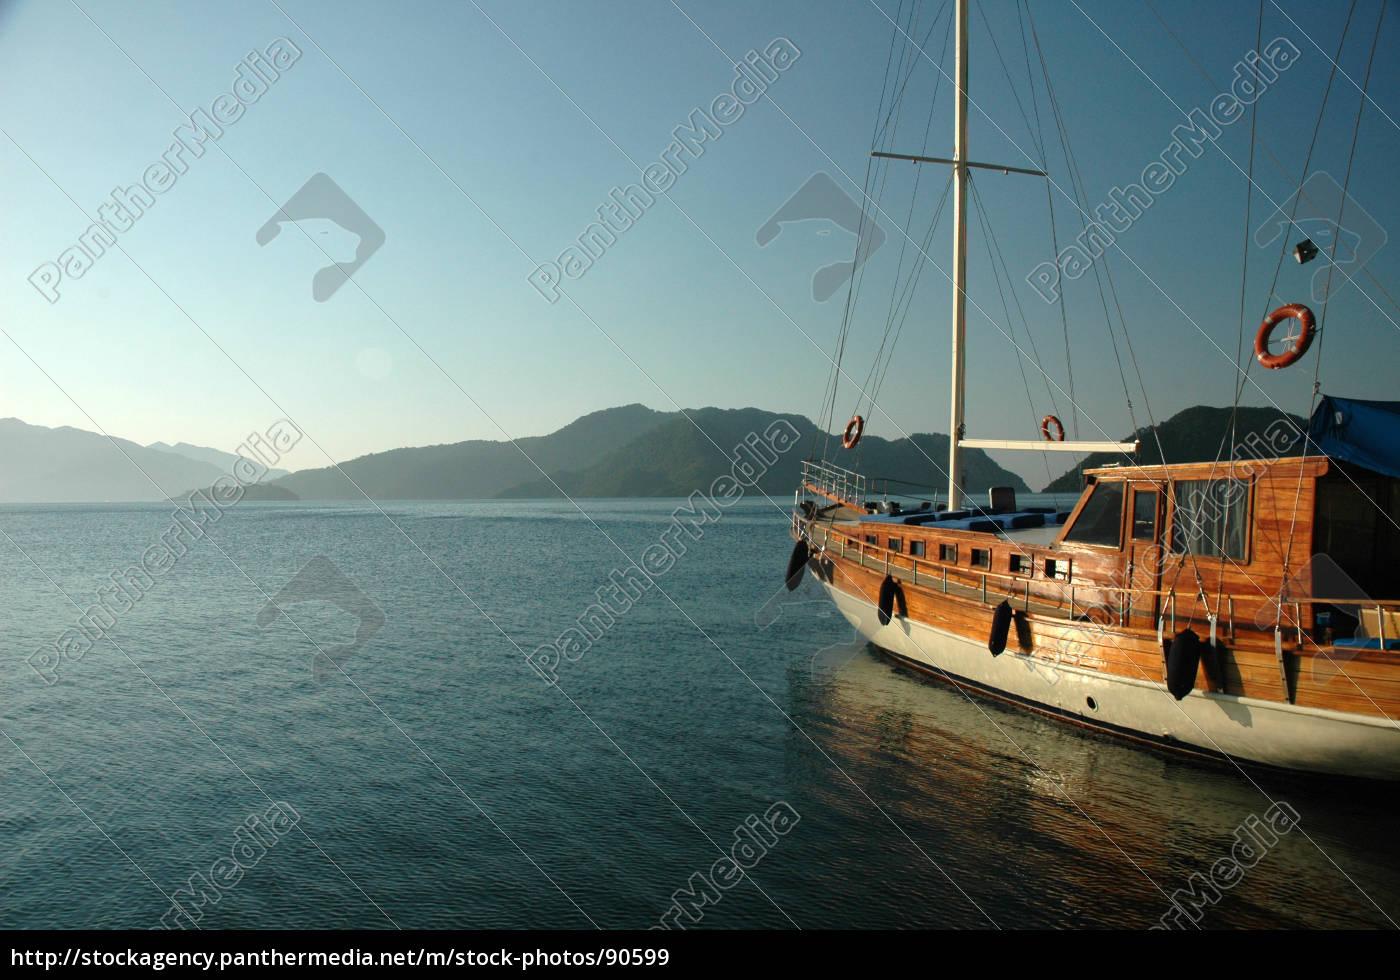 sailor - 90599